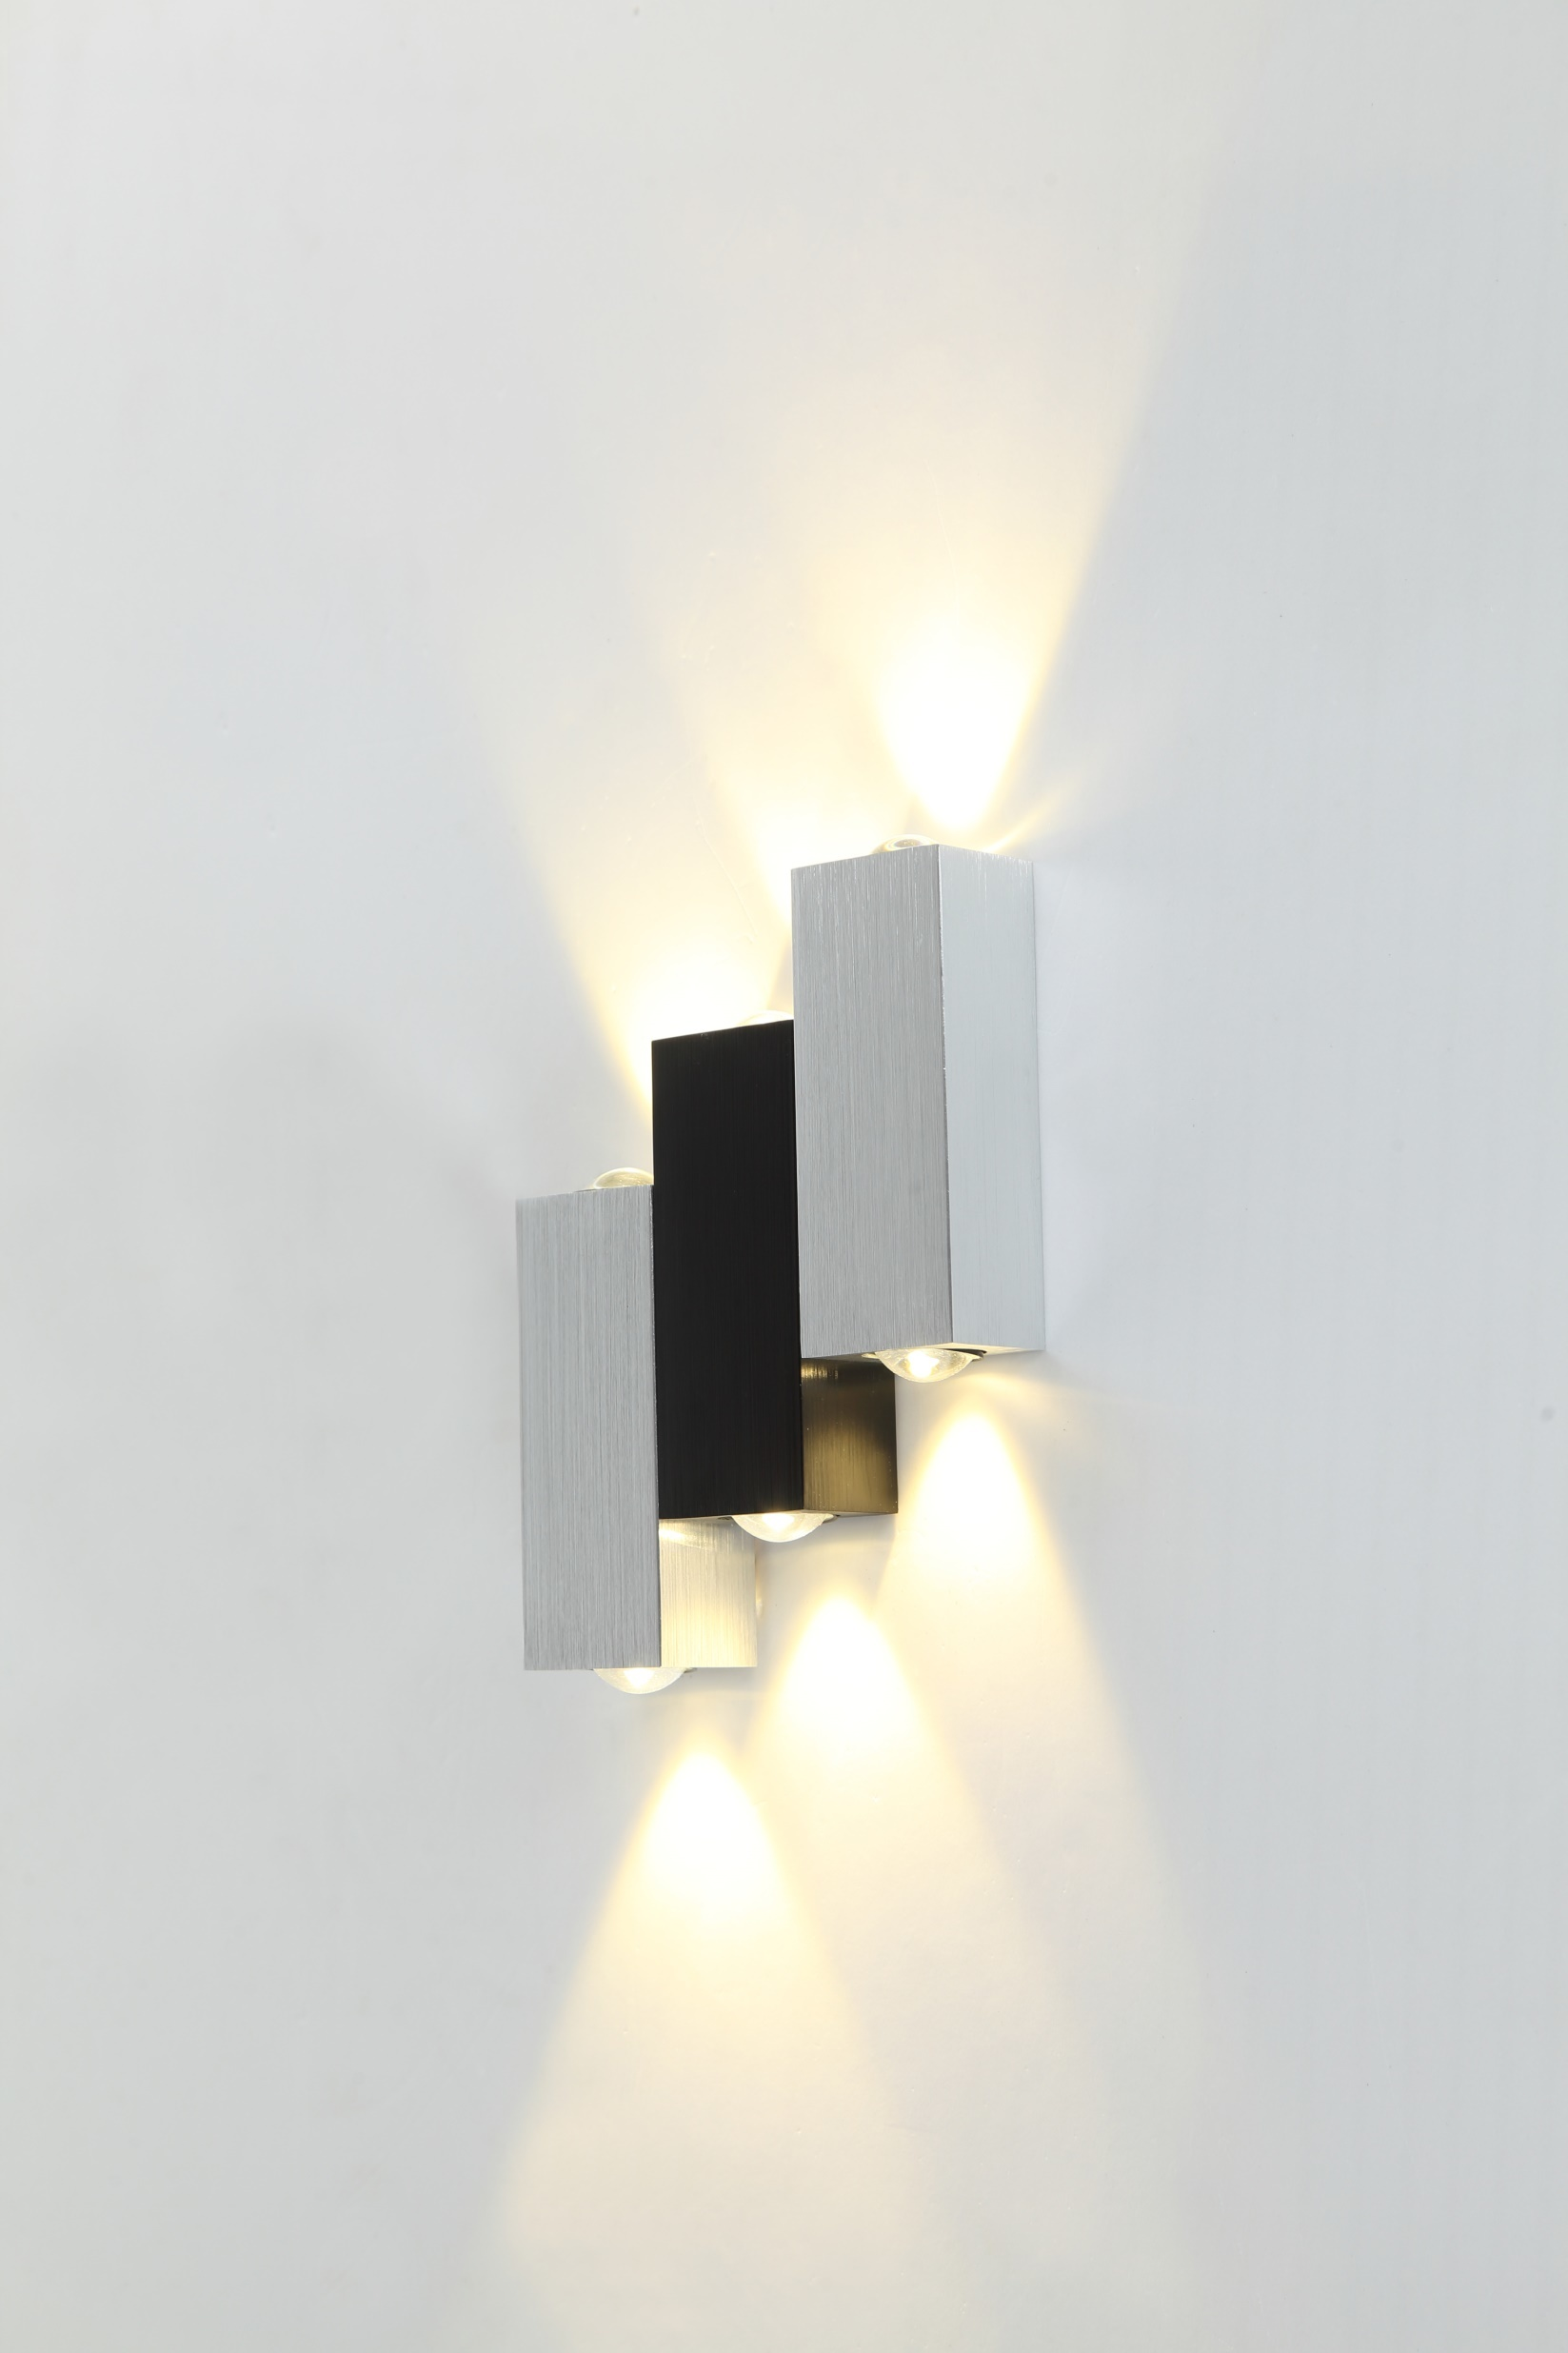 Best custom wall lamp 6W LED WALL LAMP 63882-2 Supplier